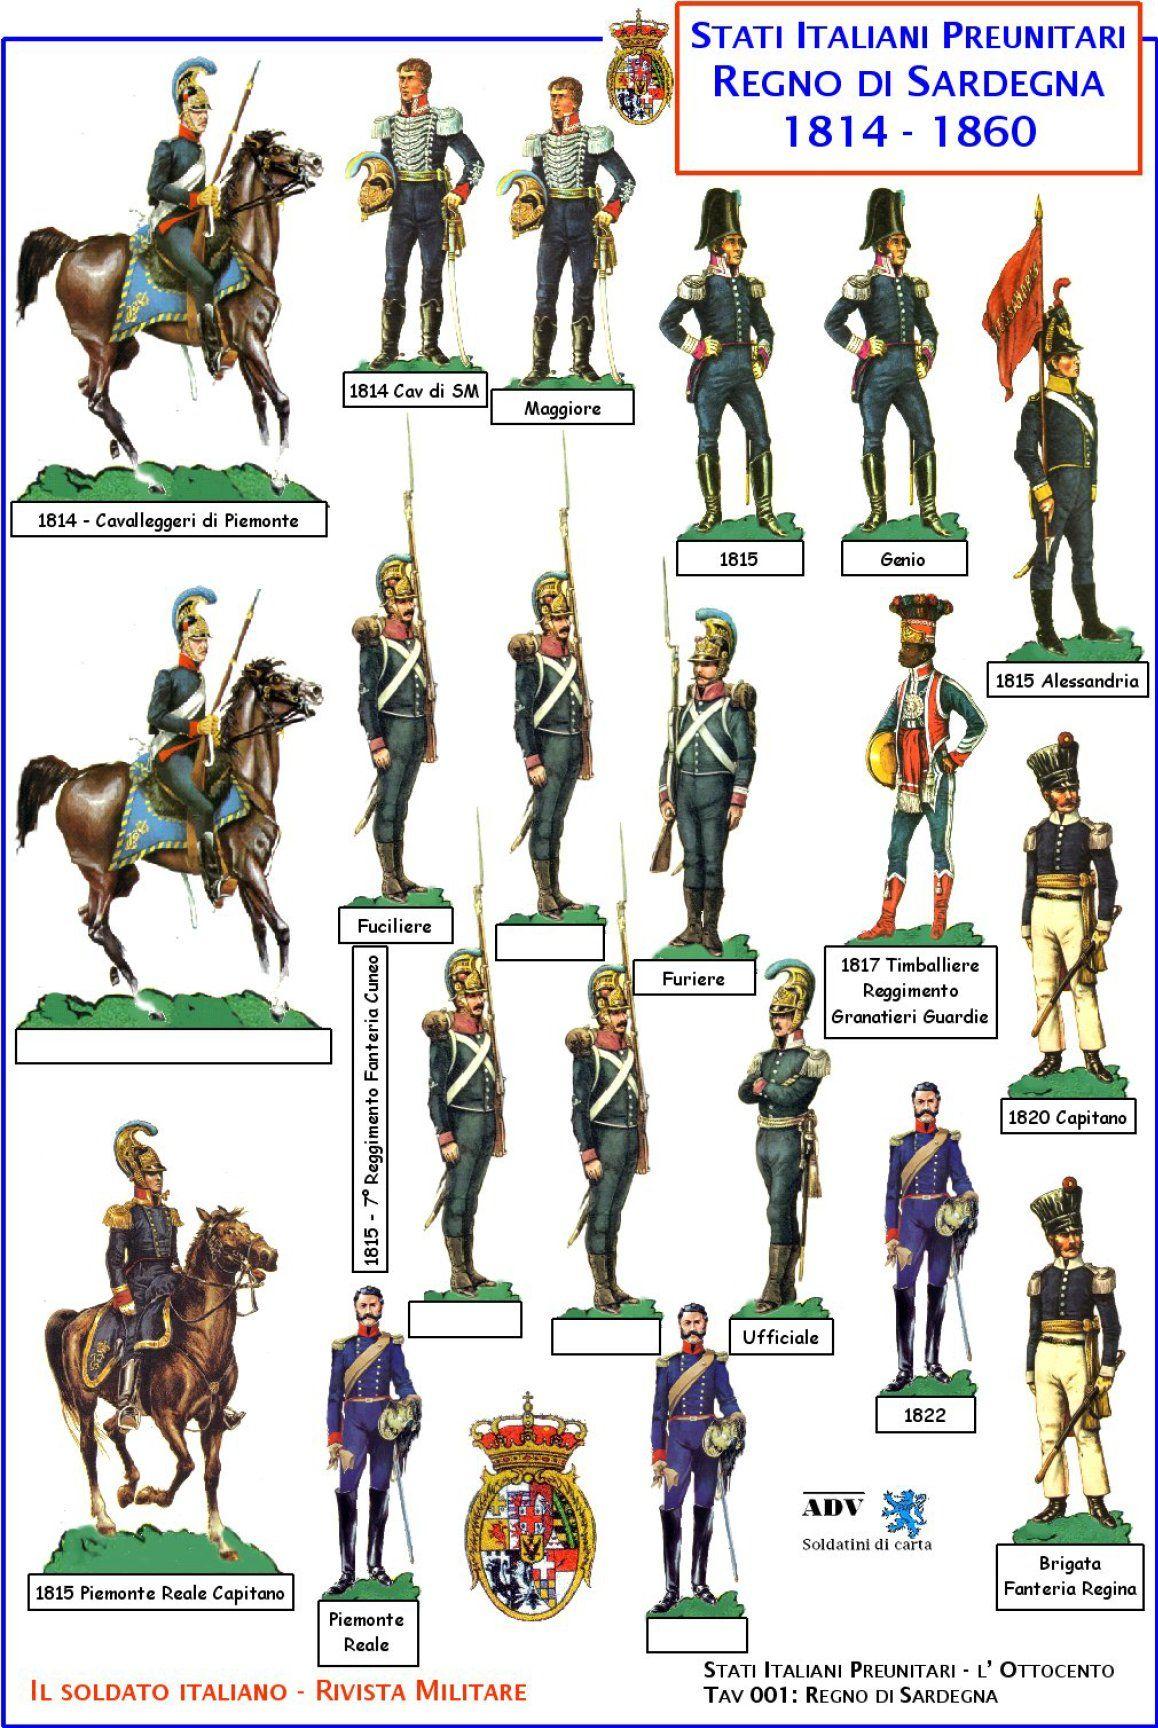 Cartina Militare Piemonte.Pin Di Jose M Su Ejercito Uniformi Militari Militari Carta